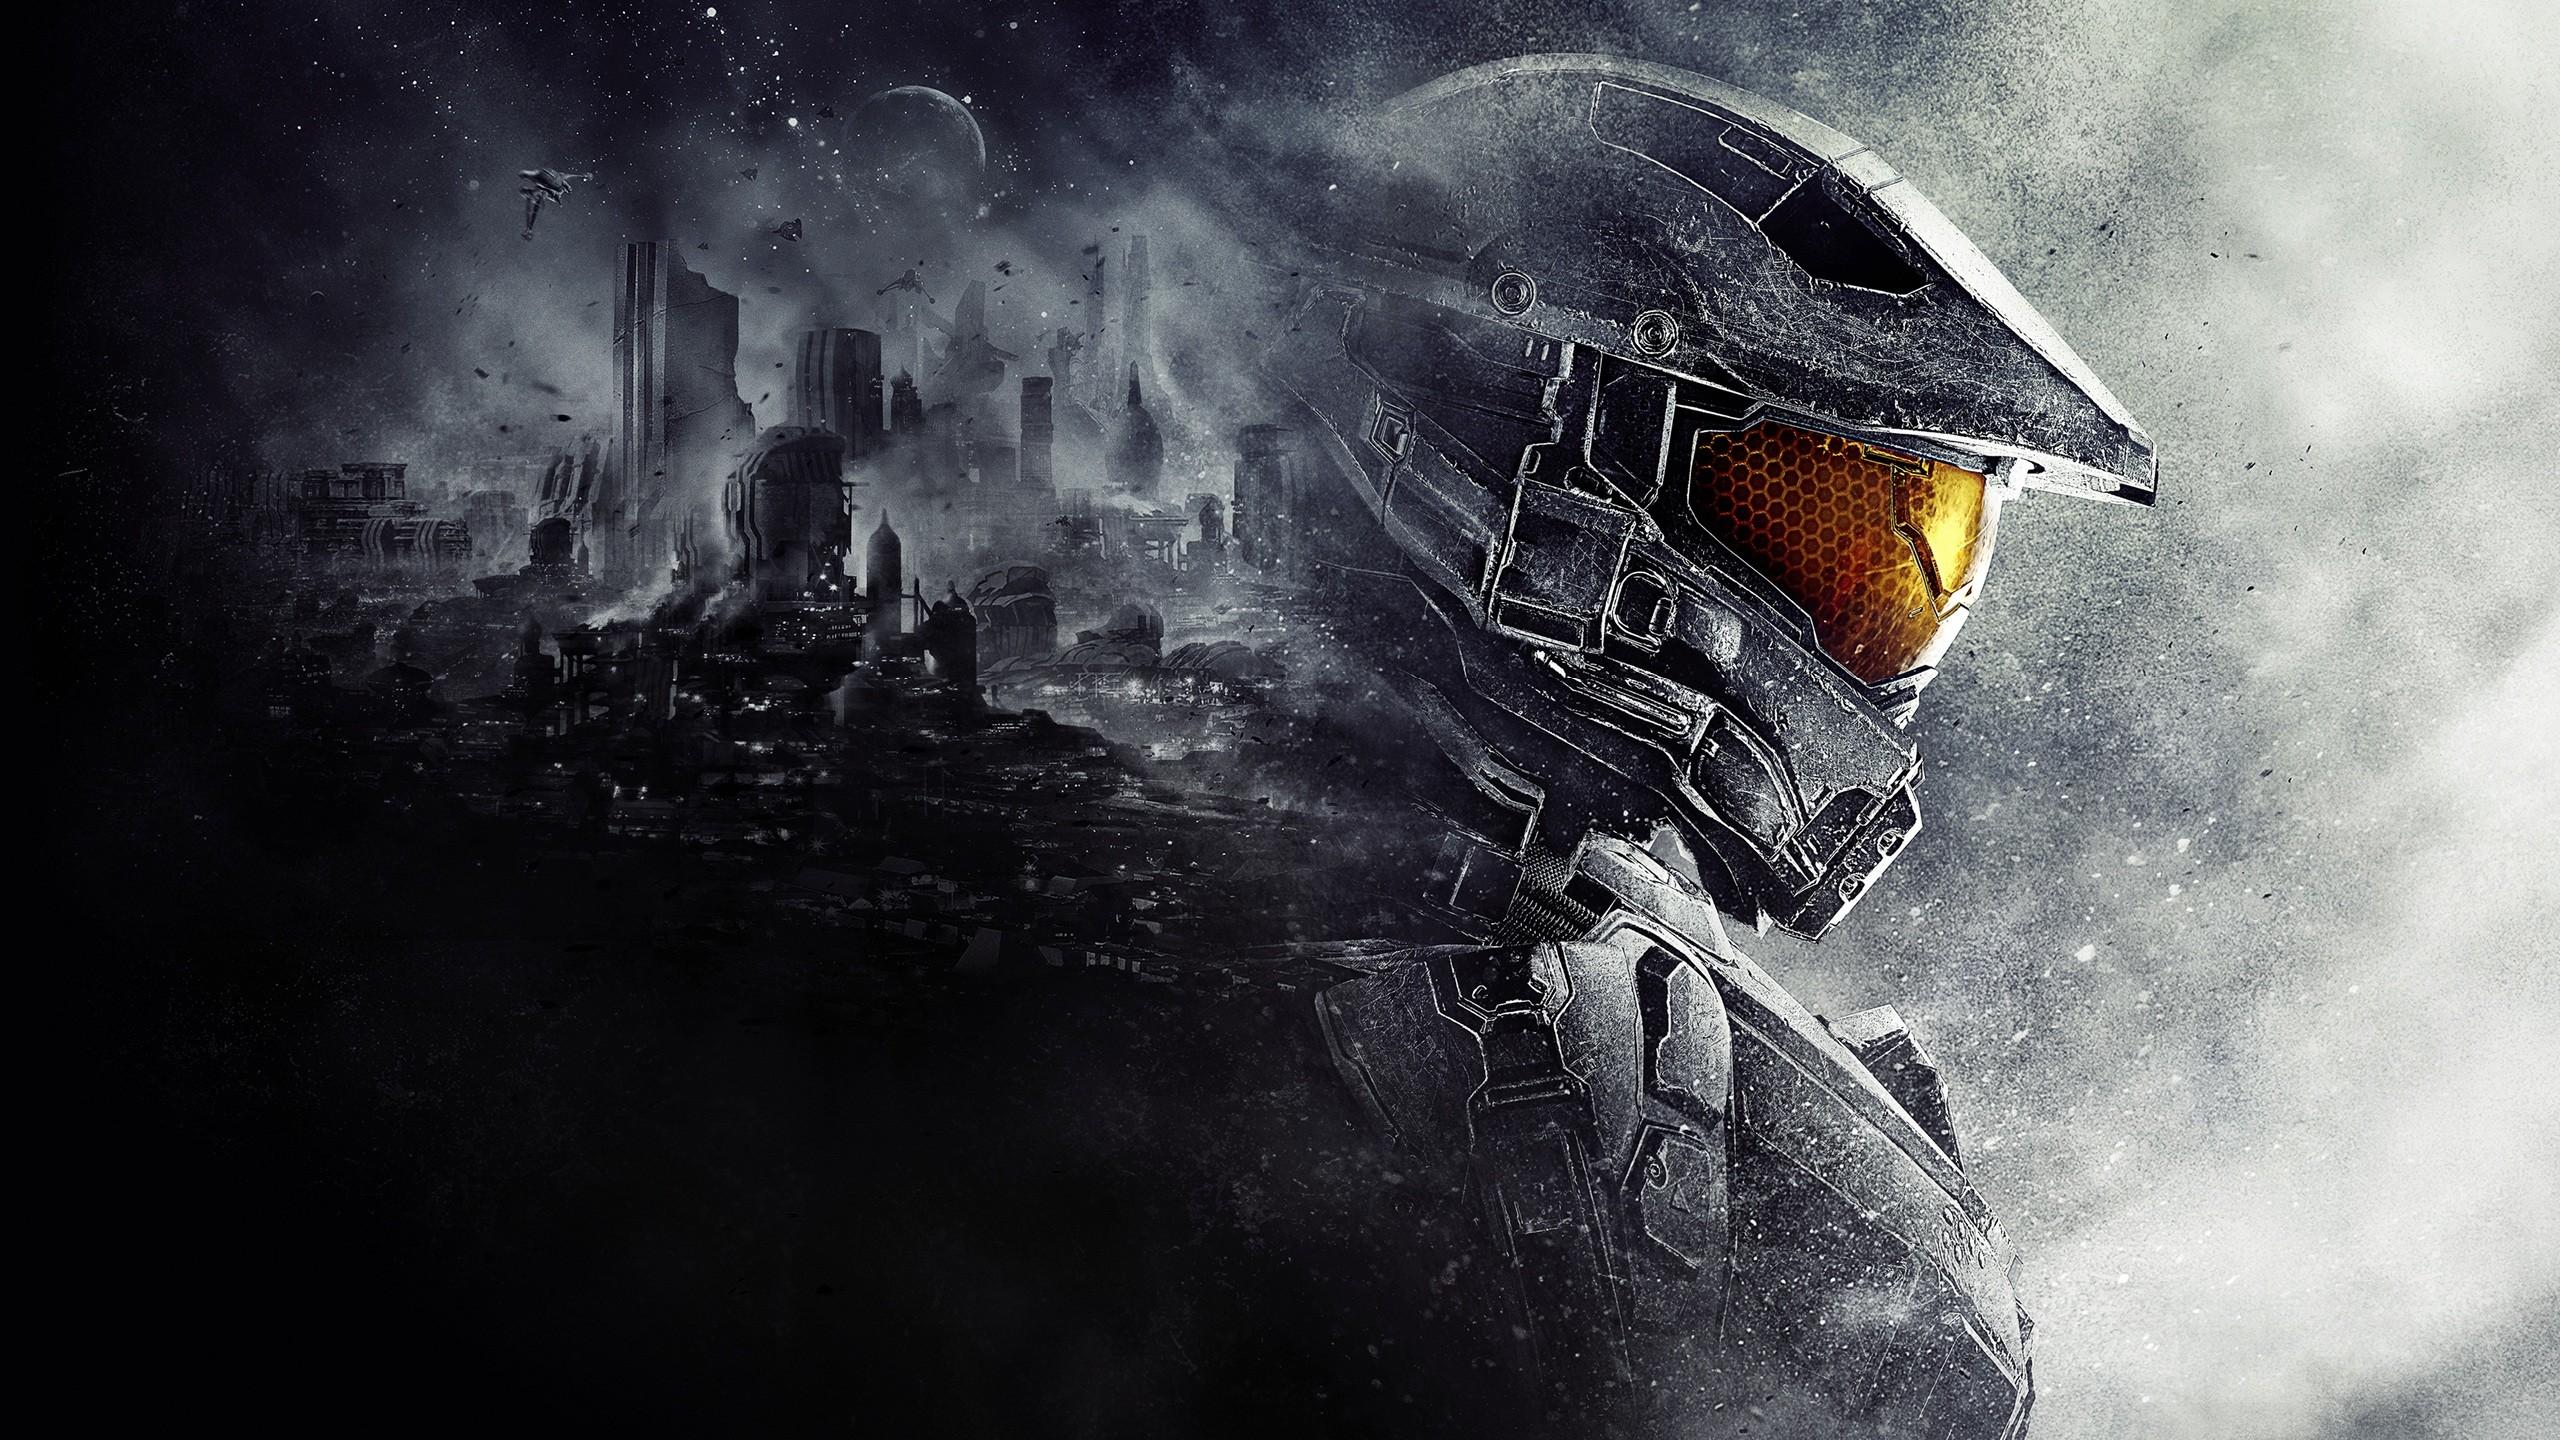 Halo 5 Guardians Widescreen Desktop | Download Free Desktop Wallpaper .